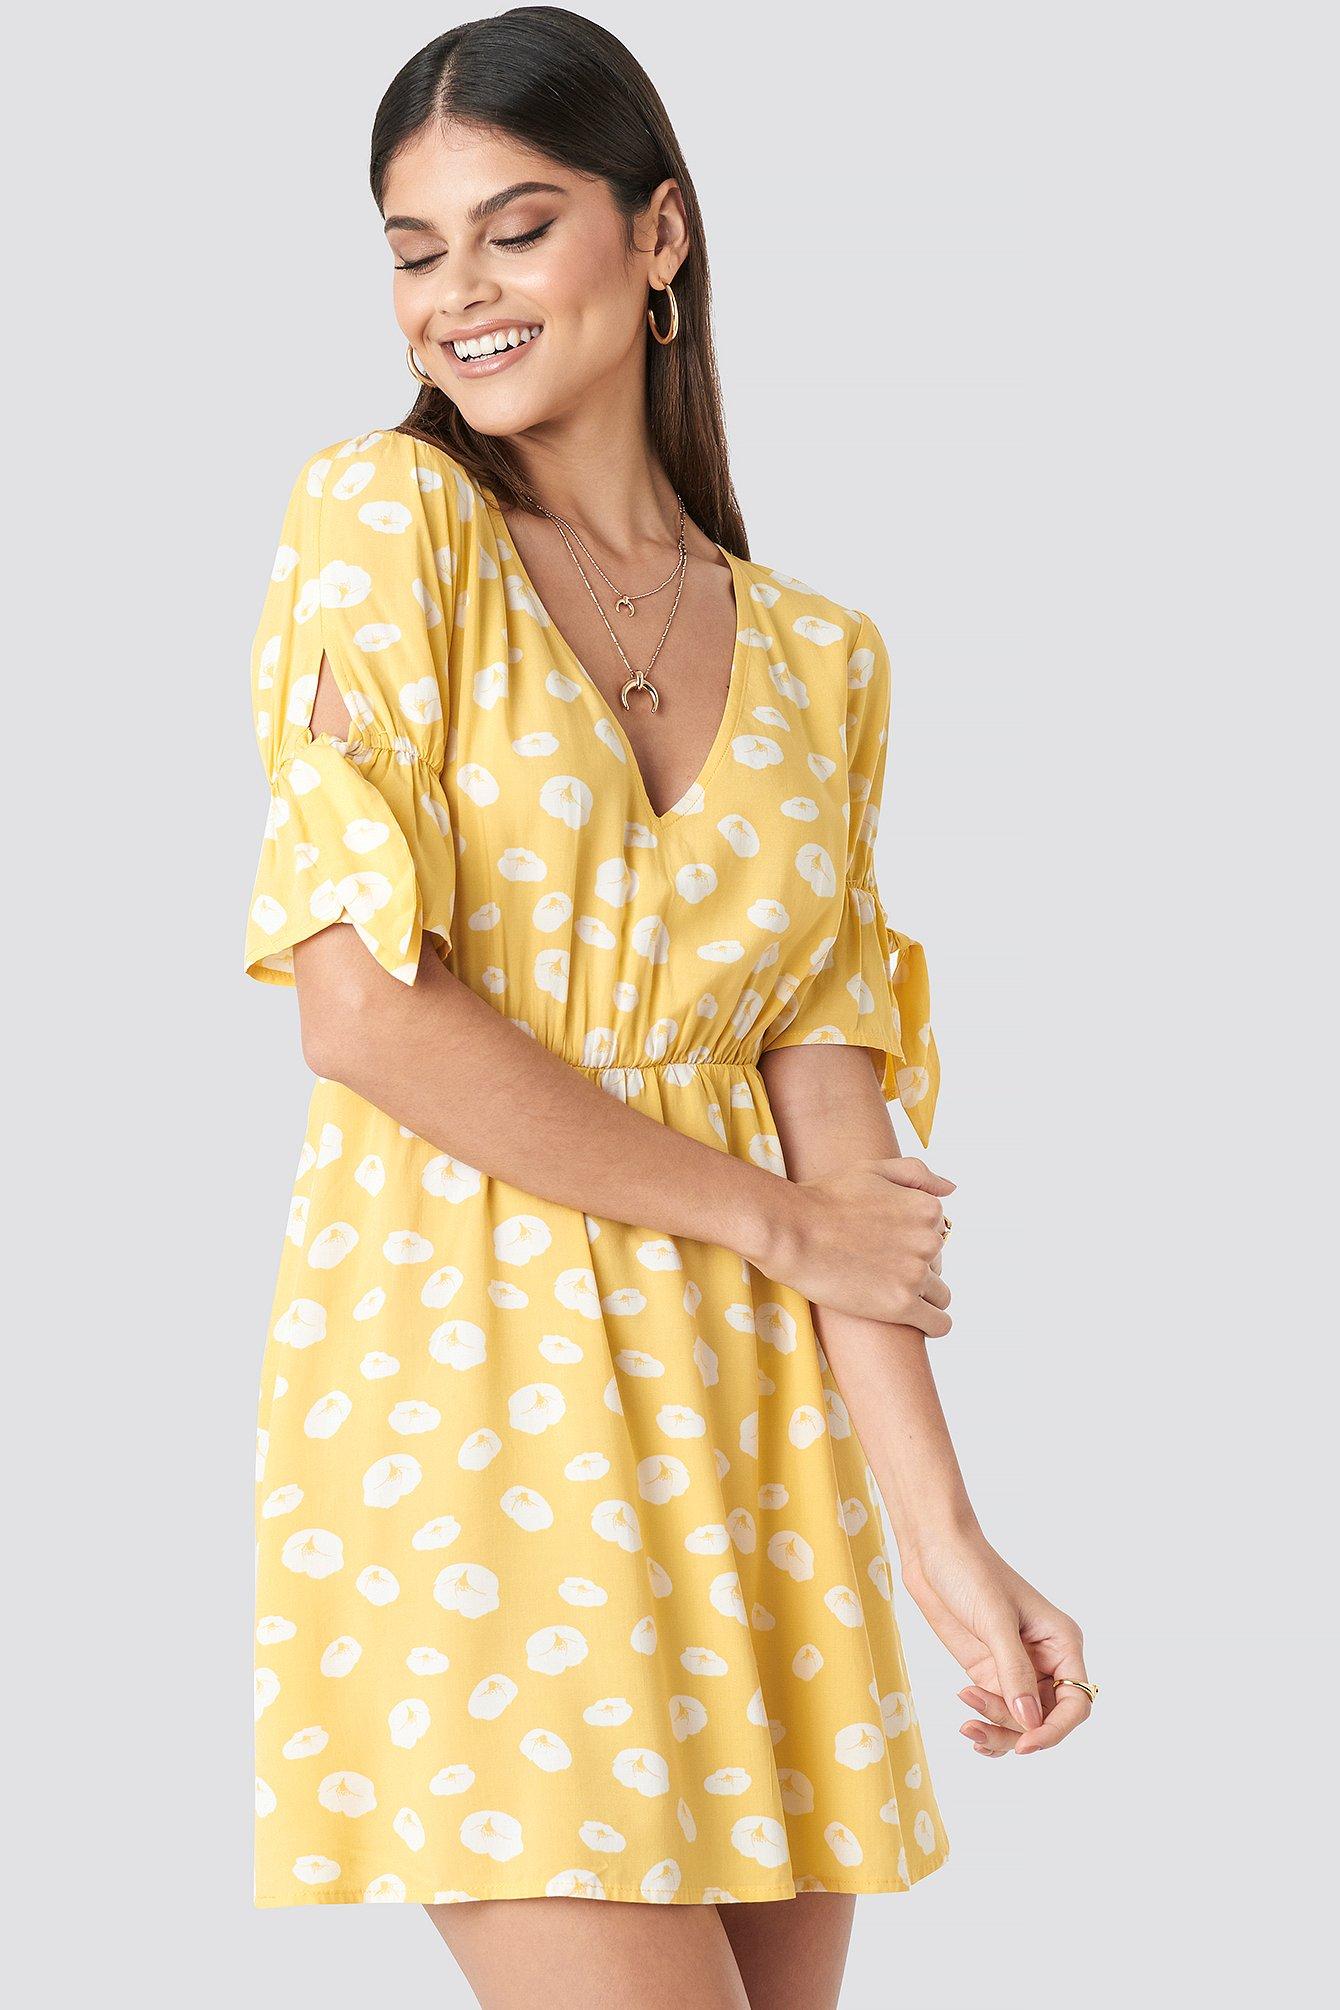 milena karl x na-kd -  Printed Mini Dress - Yellow